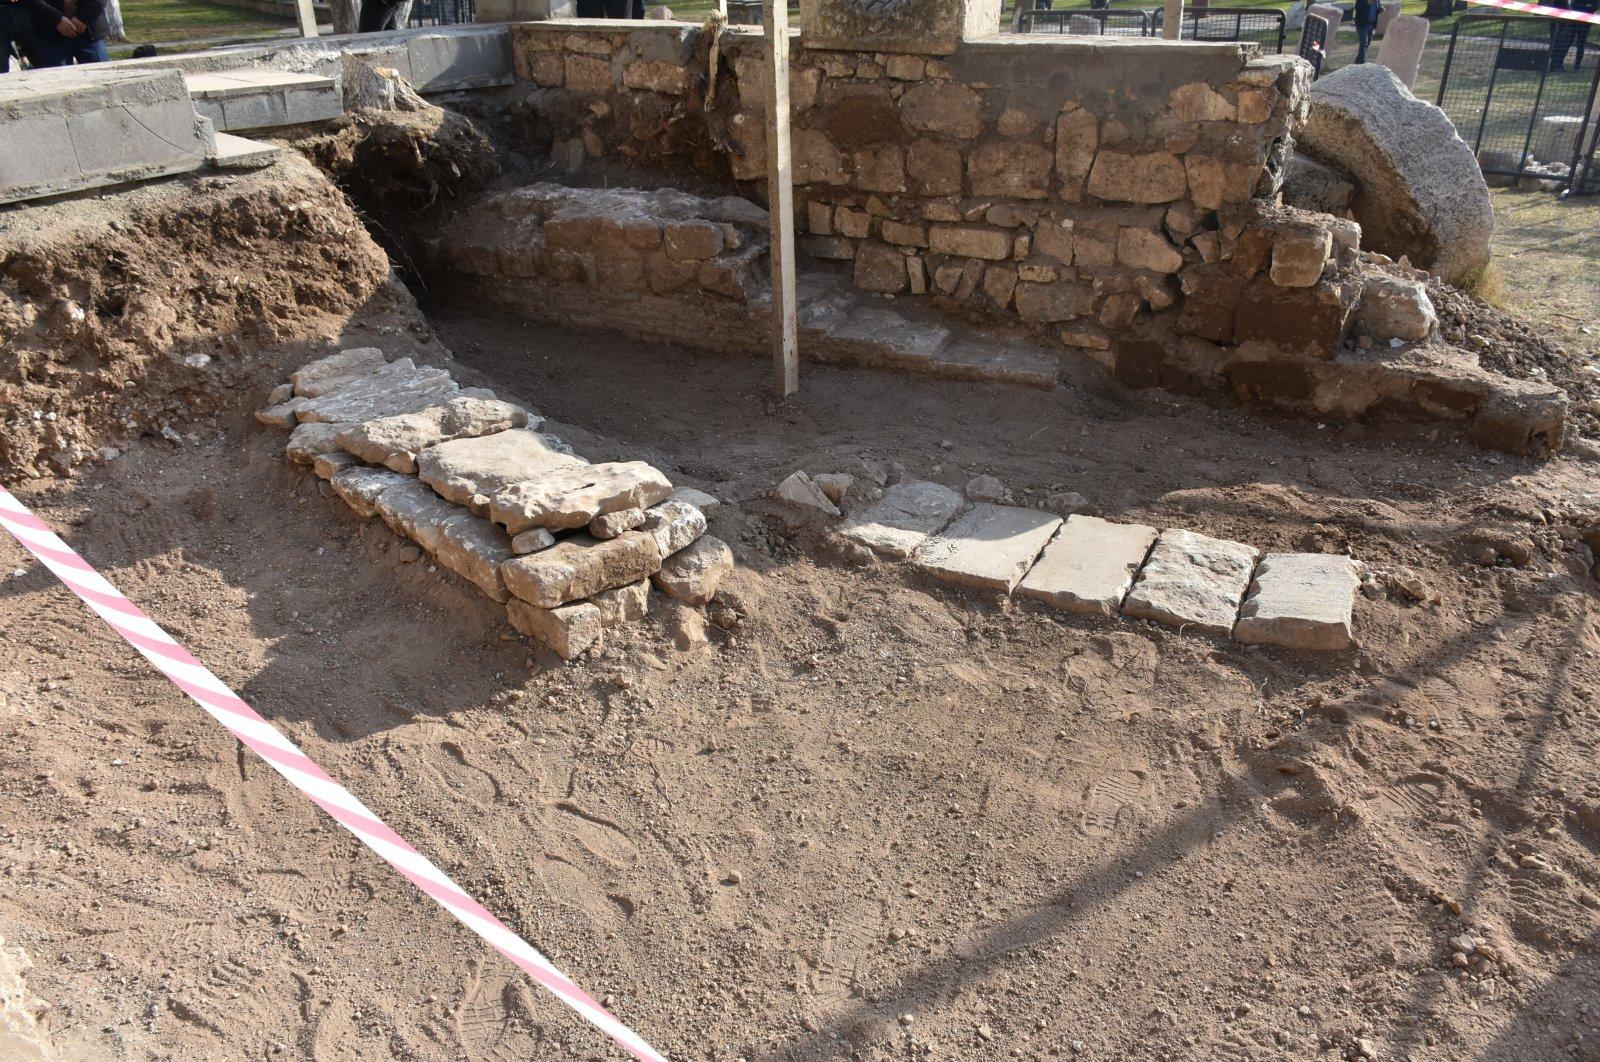 The archaeological site of the graves of Seljuk Sultan of Rum Kılıç Arslan I and his daughter Saide Hatun in Diyarbakır, southeastern Turkey, Jan. 12, 2020. (AA Photo)